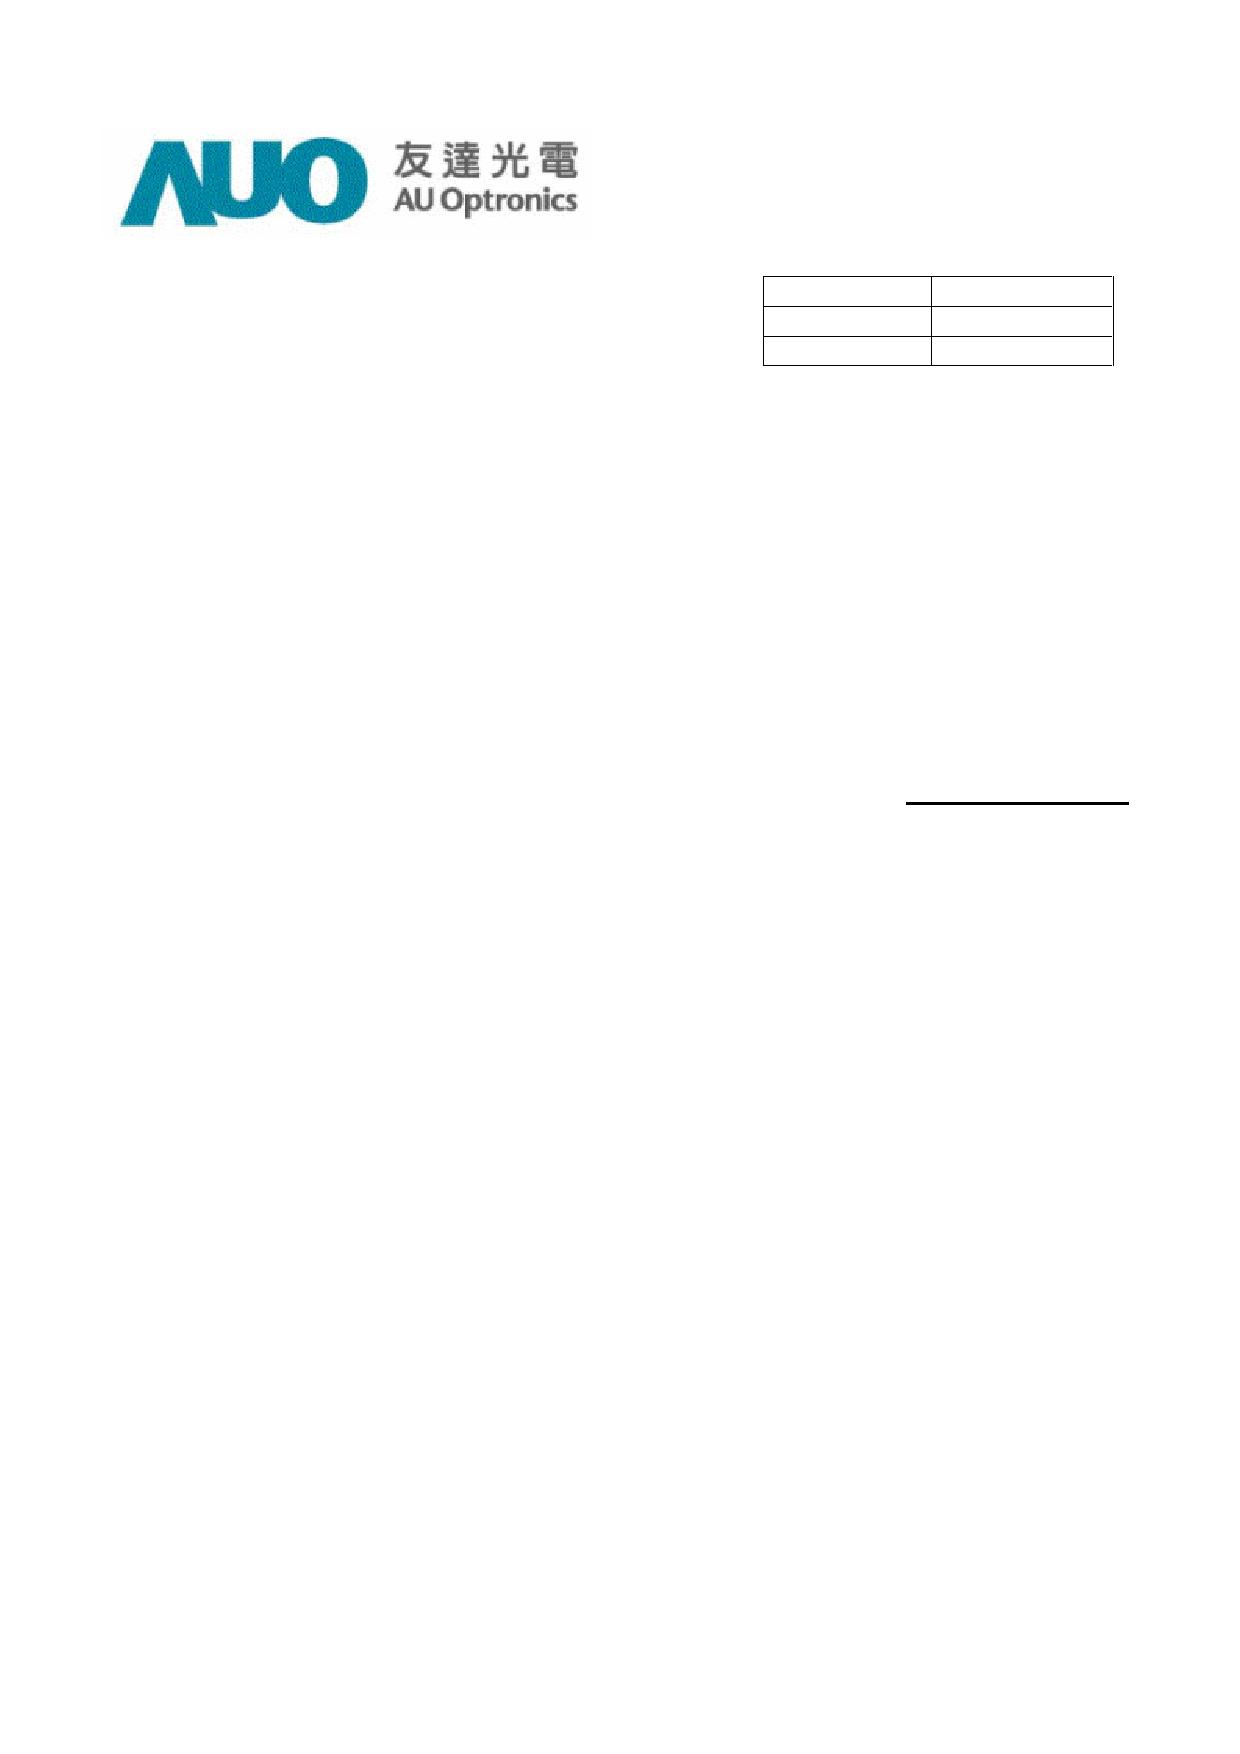 A085FW01_V7 datasheet, circuit